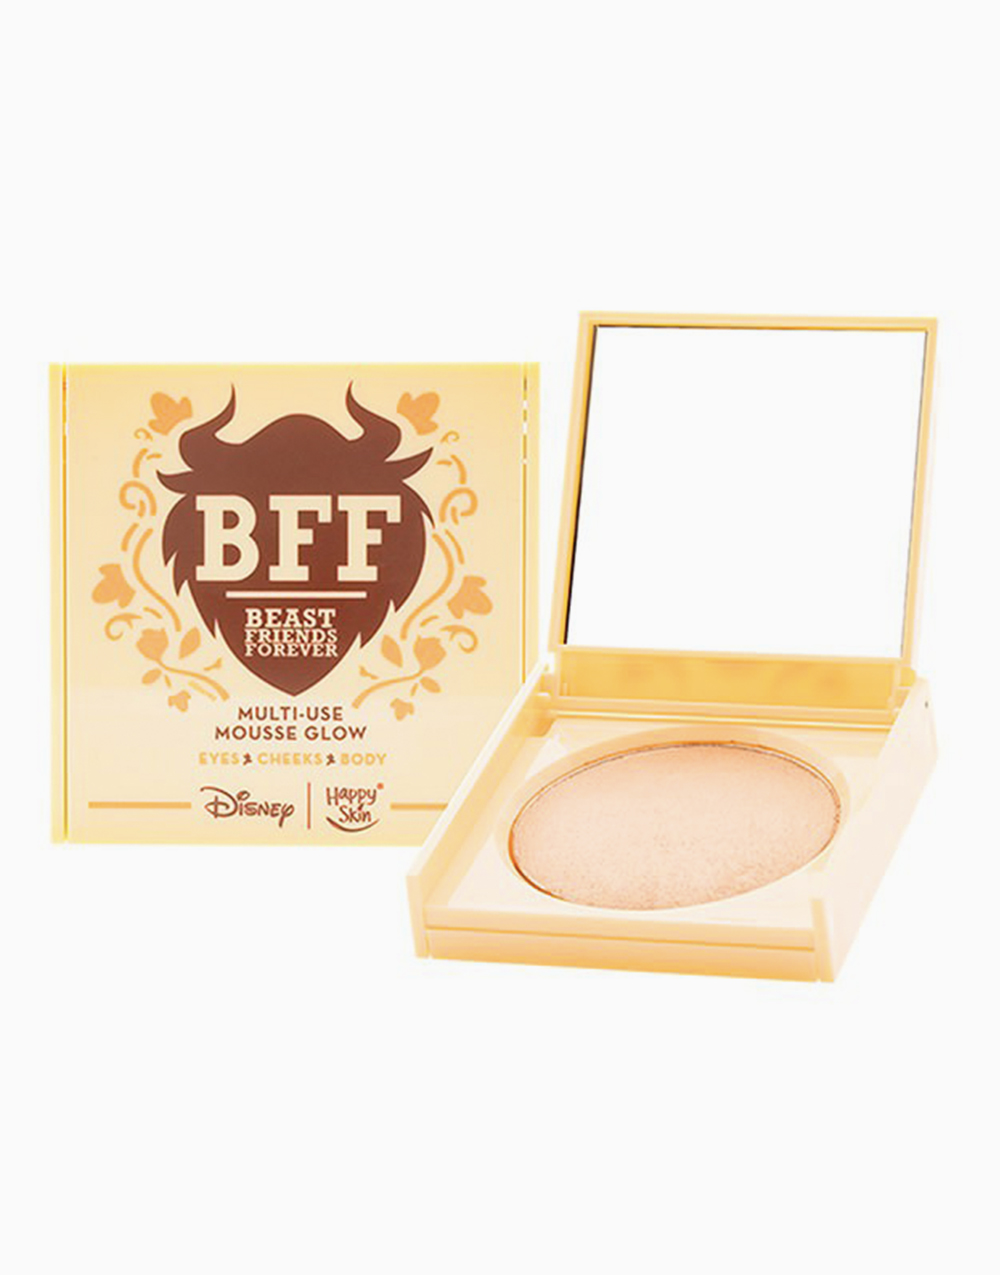 Happy Skin x Disney Multi Use Mousse by Happy Skin | BFF